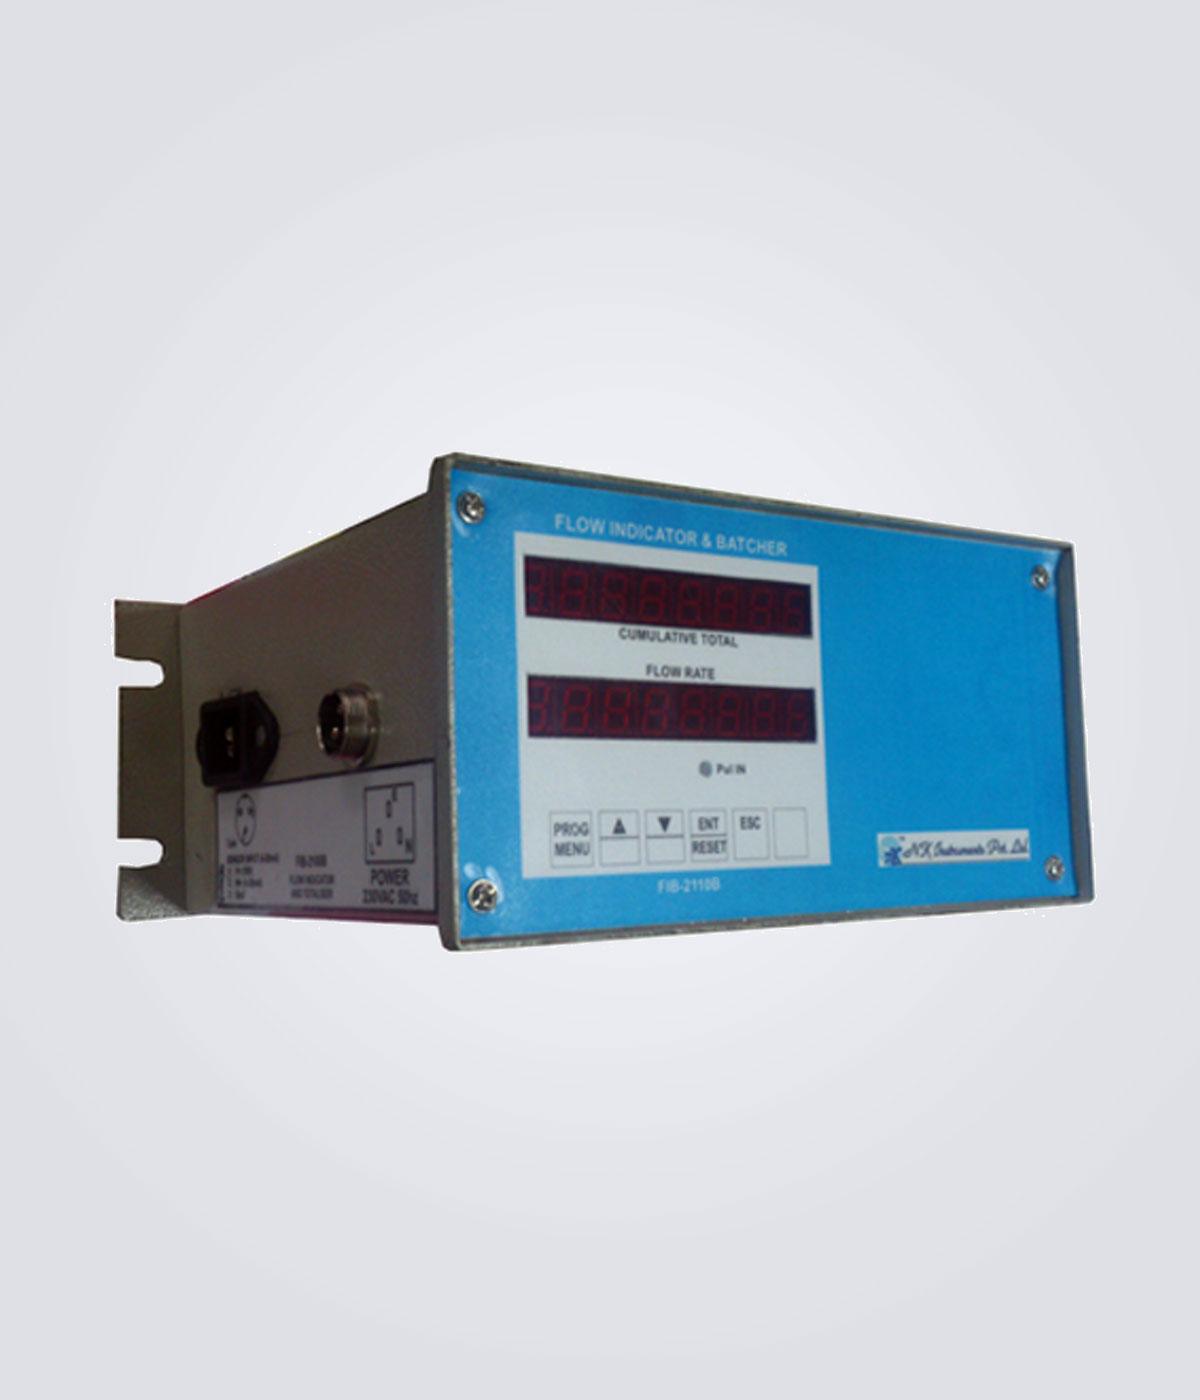 Panel Mount 4 20 Ma Digital Indicator : Customized process indicator controllers current